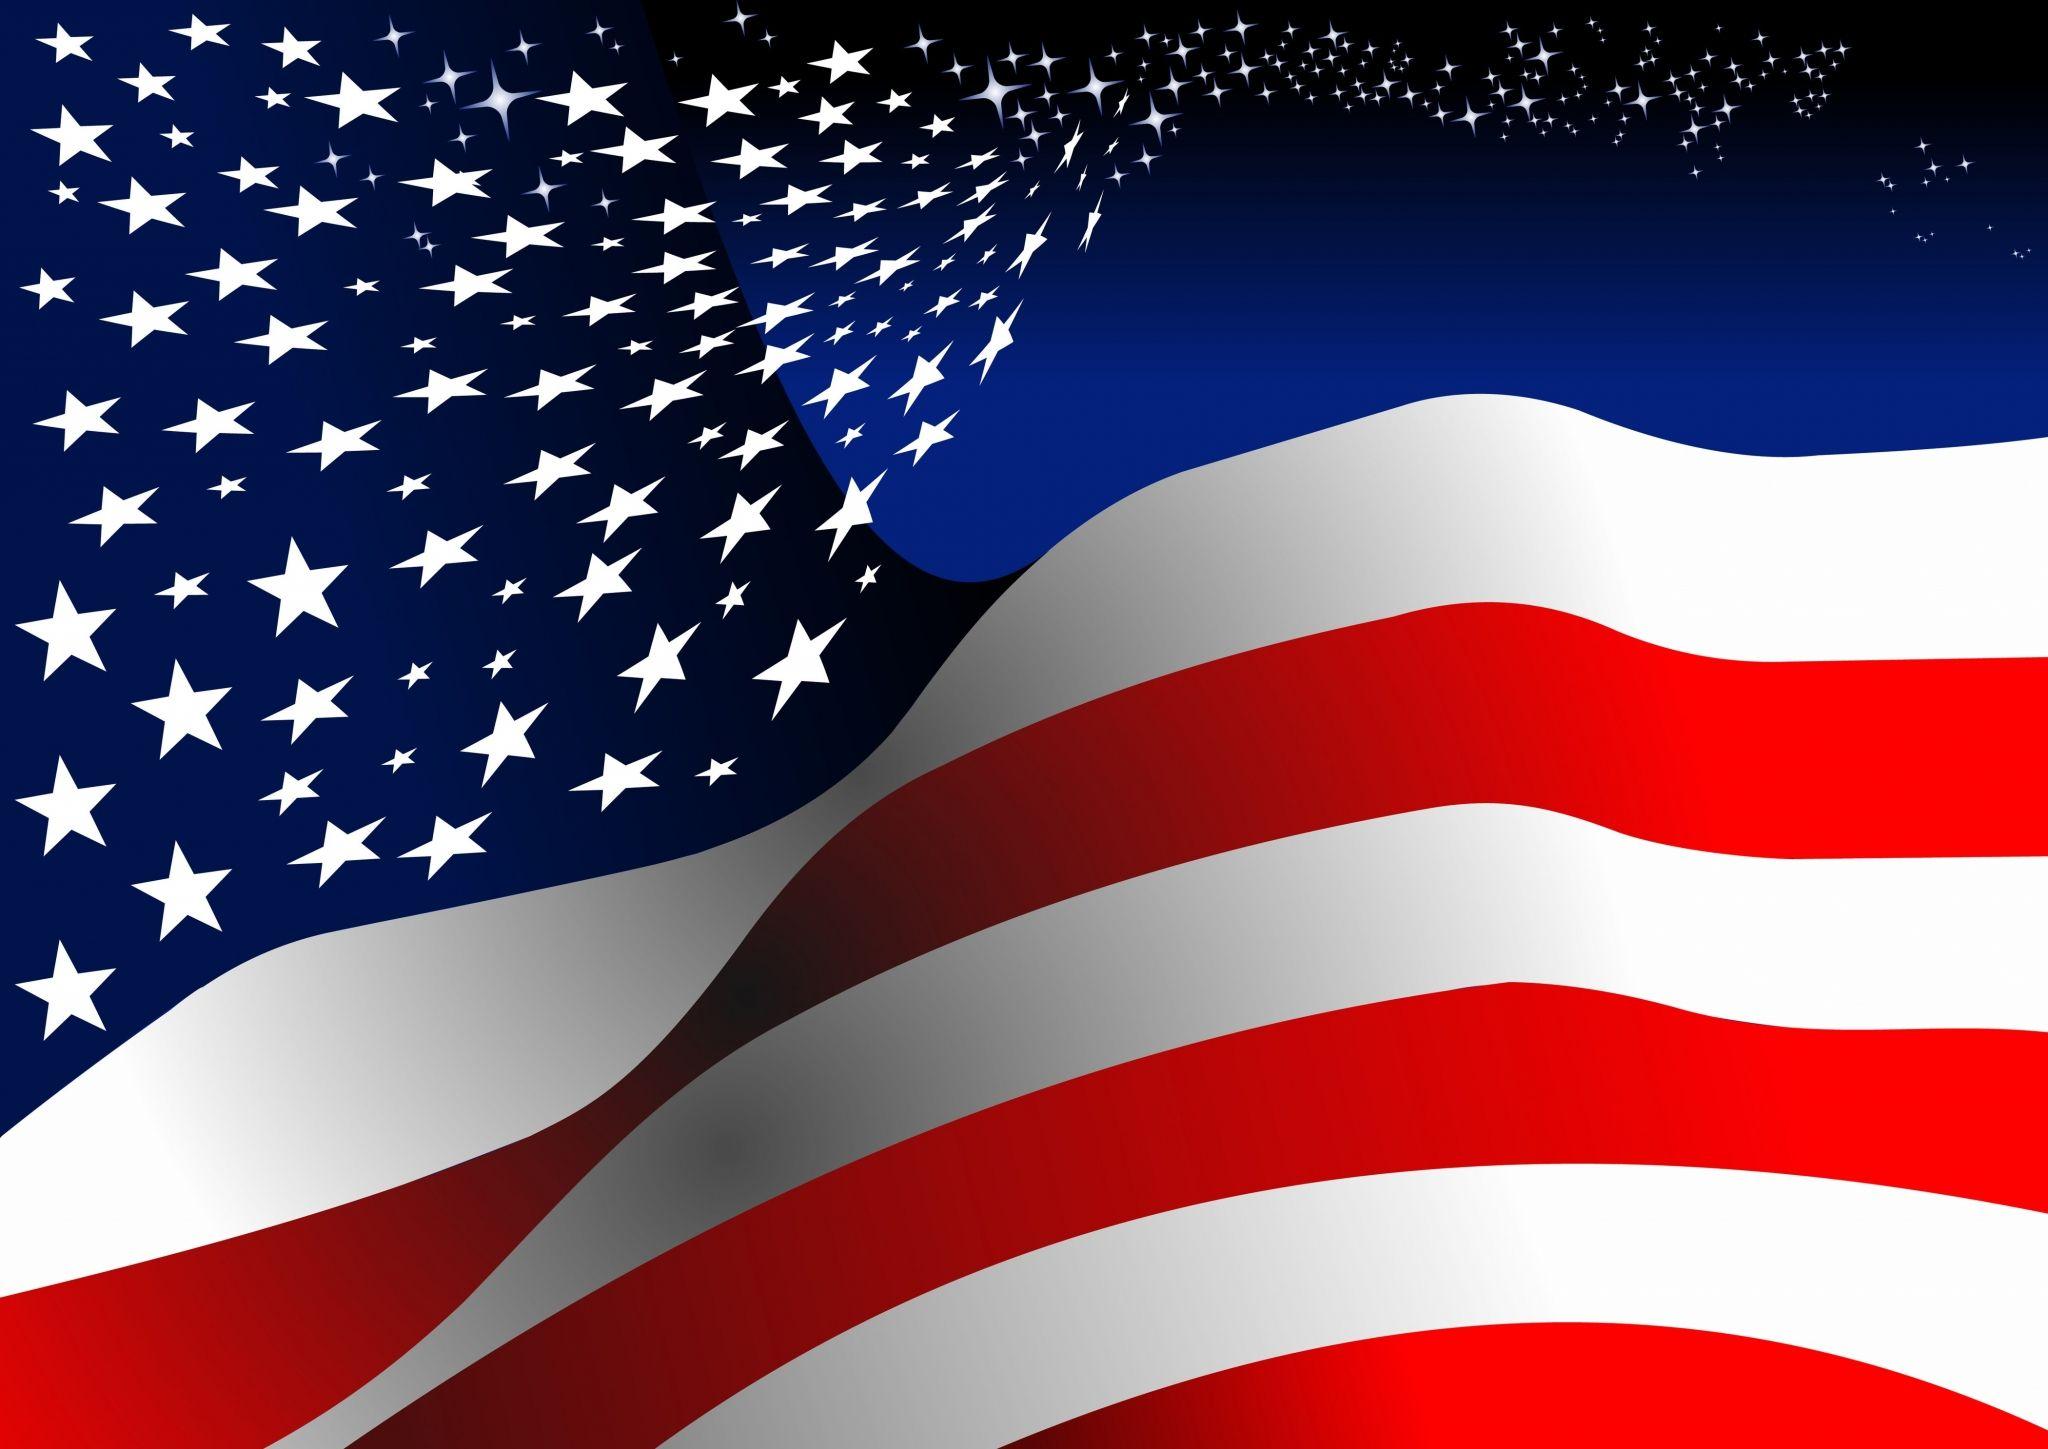 2048x1449 american flag free high resolution wallpaper